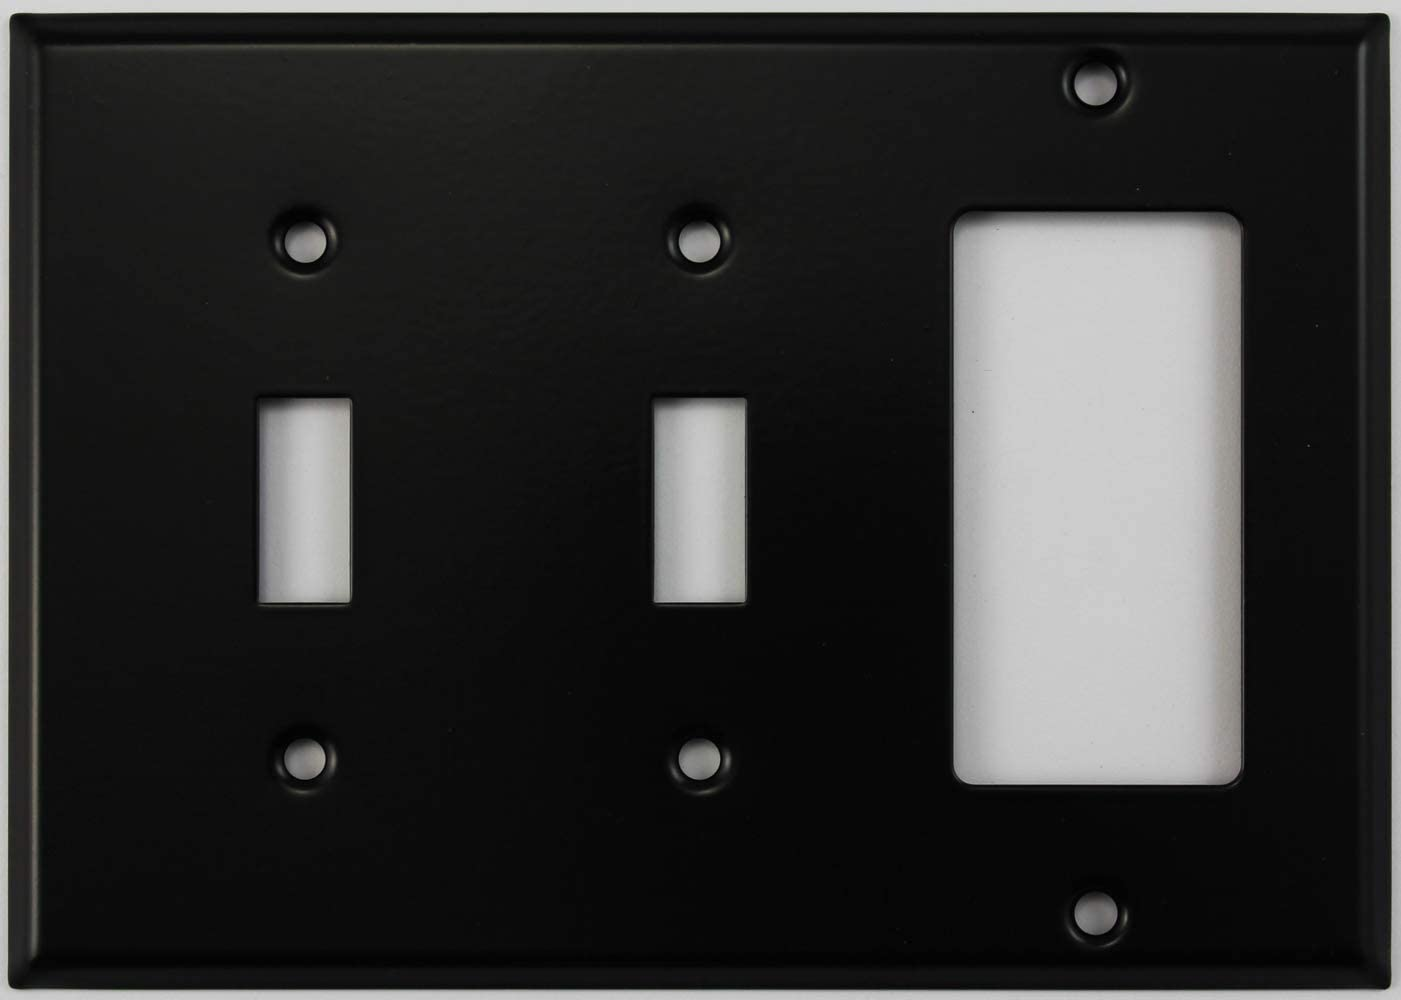 Black 3 Gang Combo Wall Plate 2 Toggle Light Switches 1 Gfci Rocker Opening